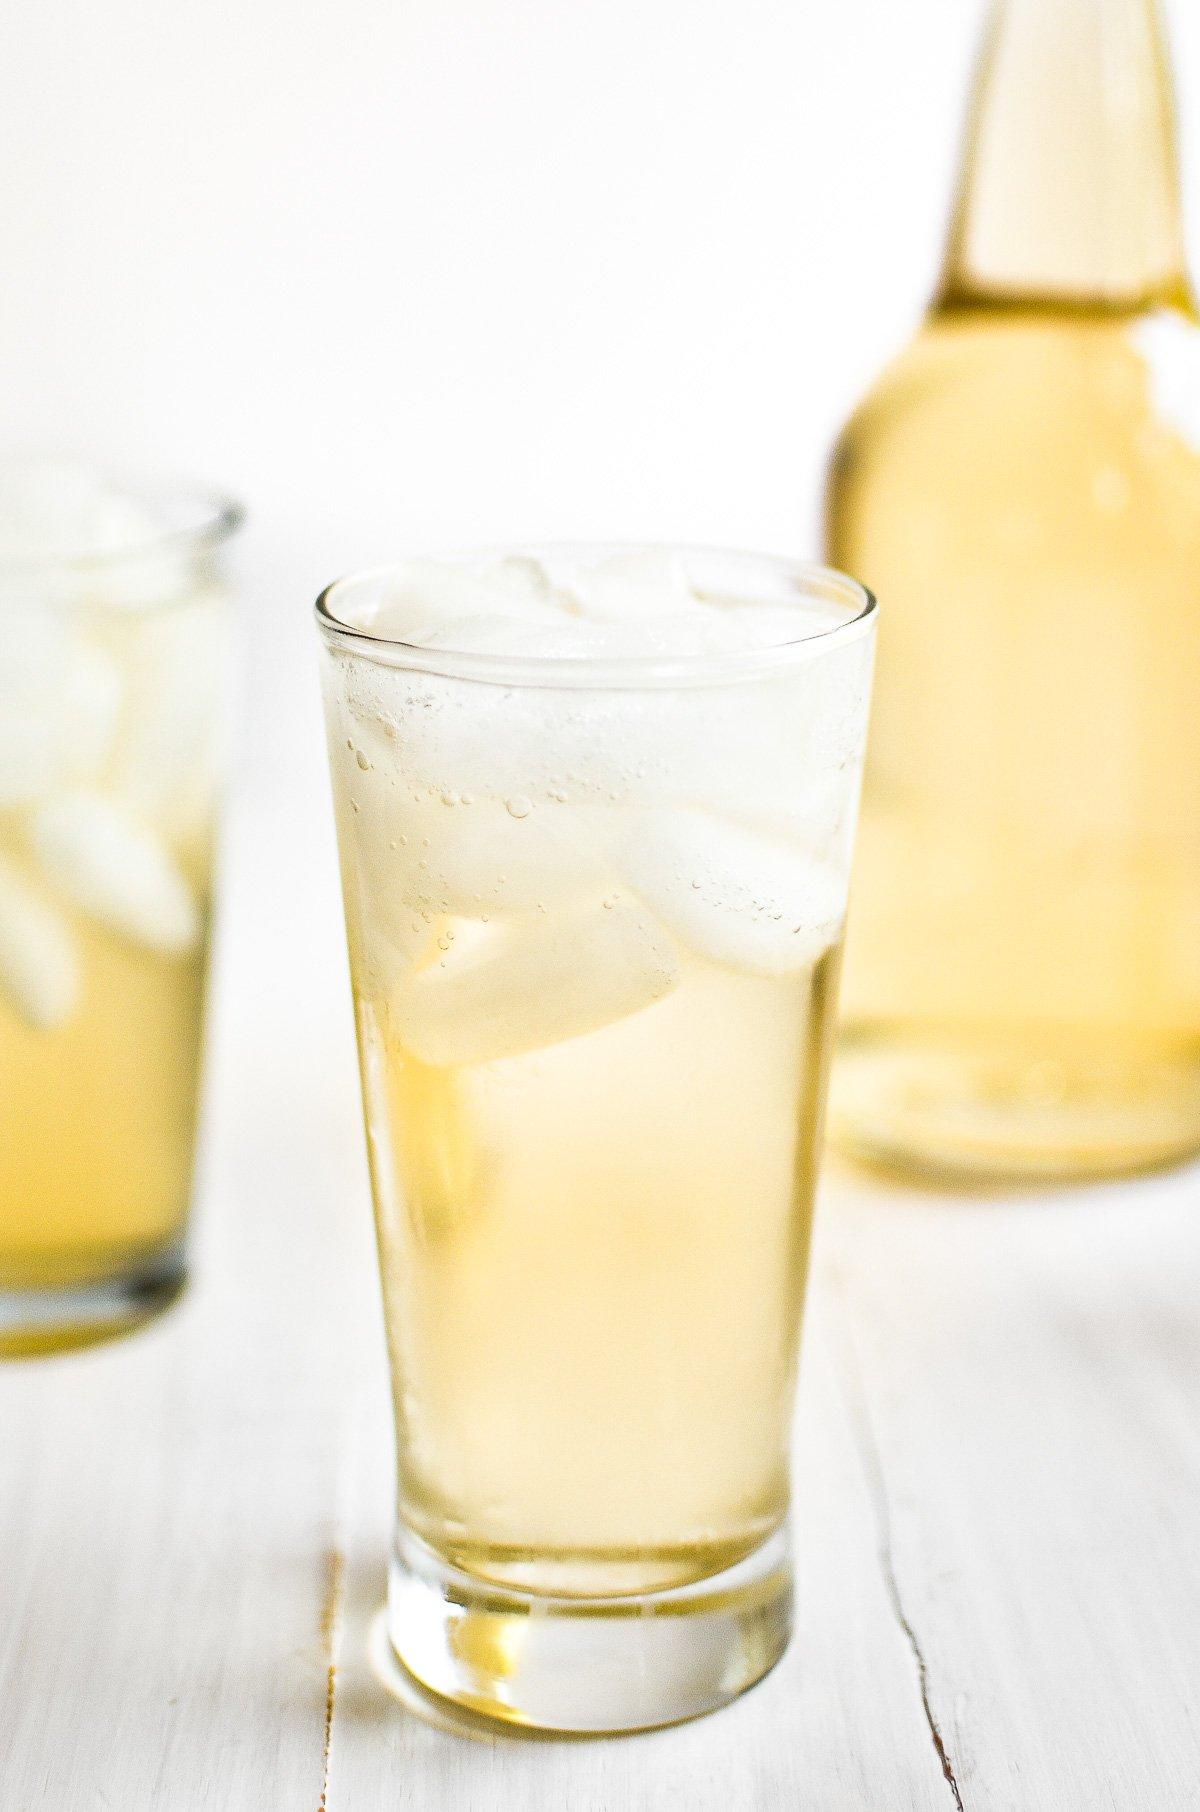 homemade cream soda in a glass